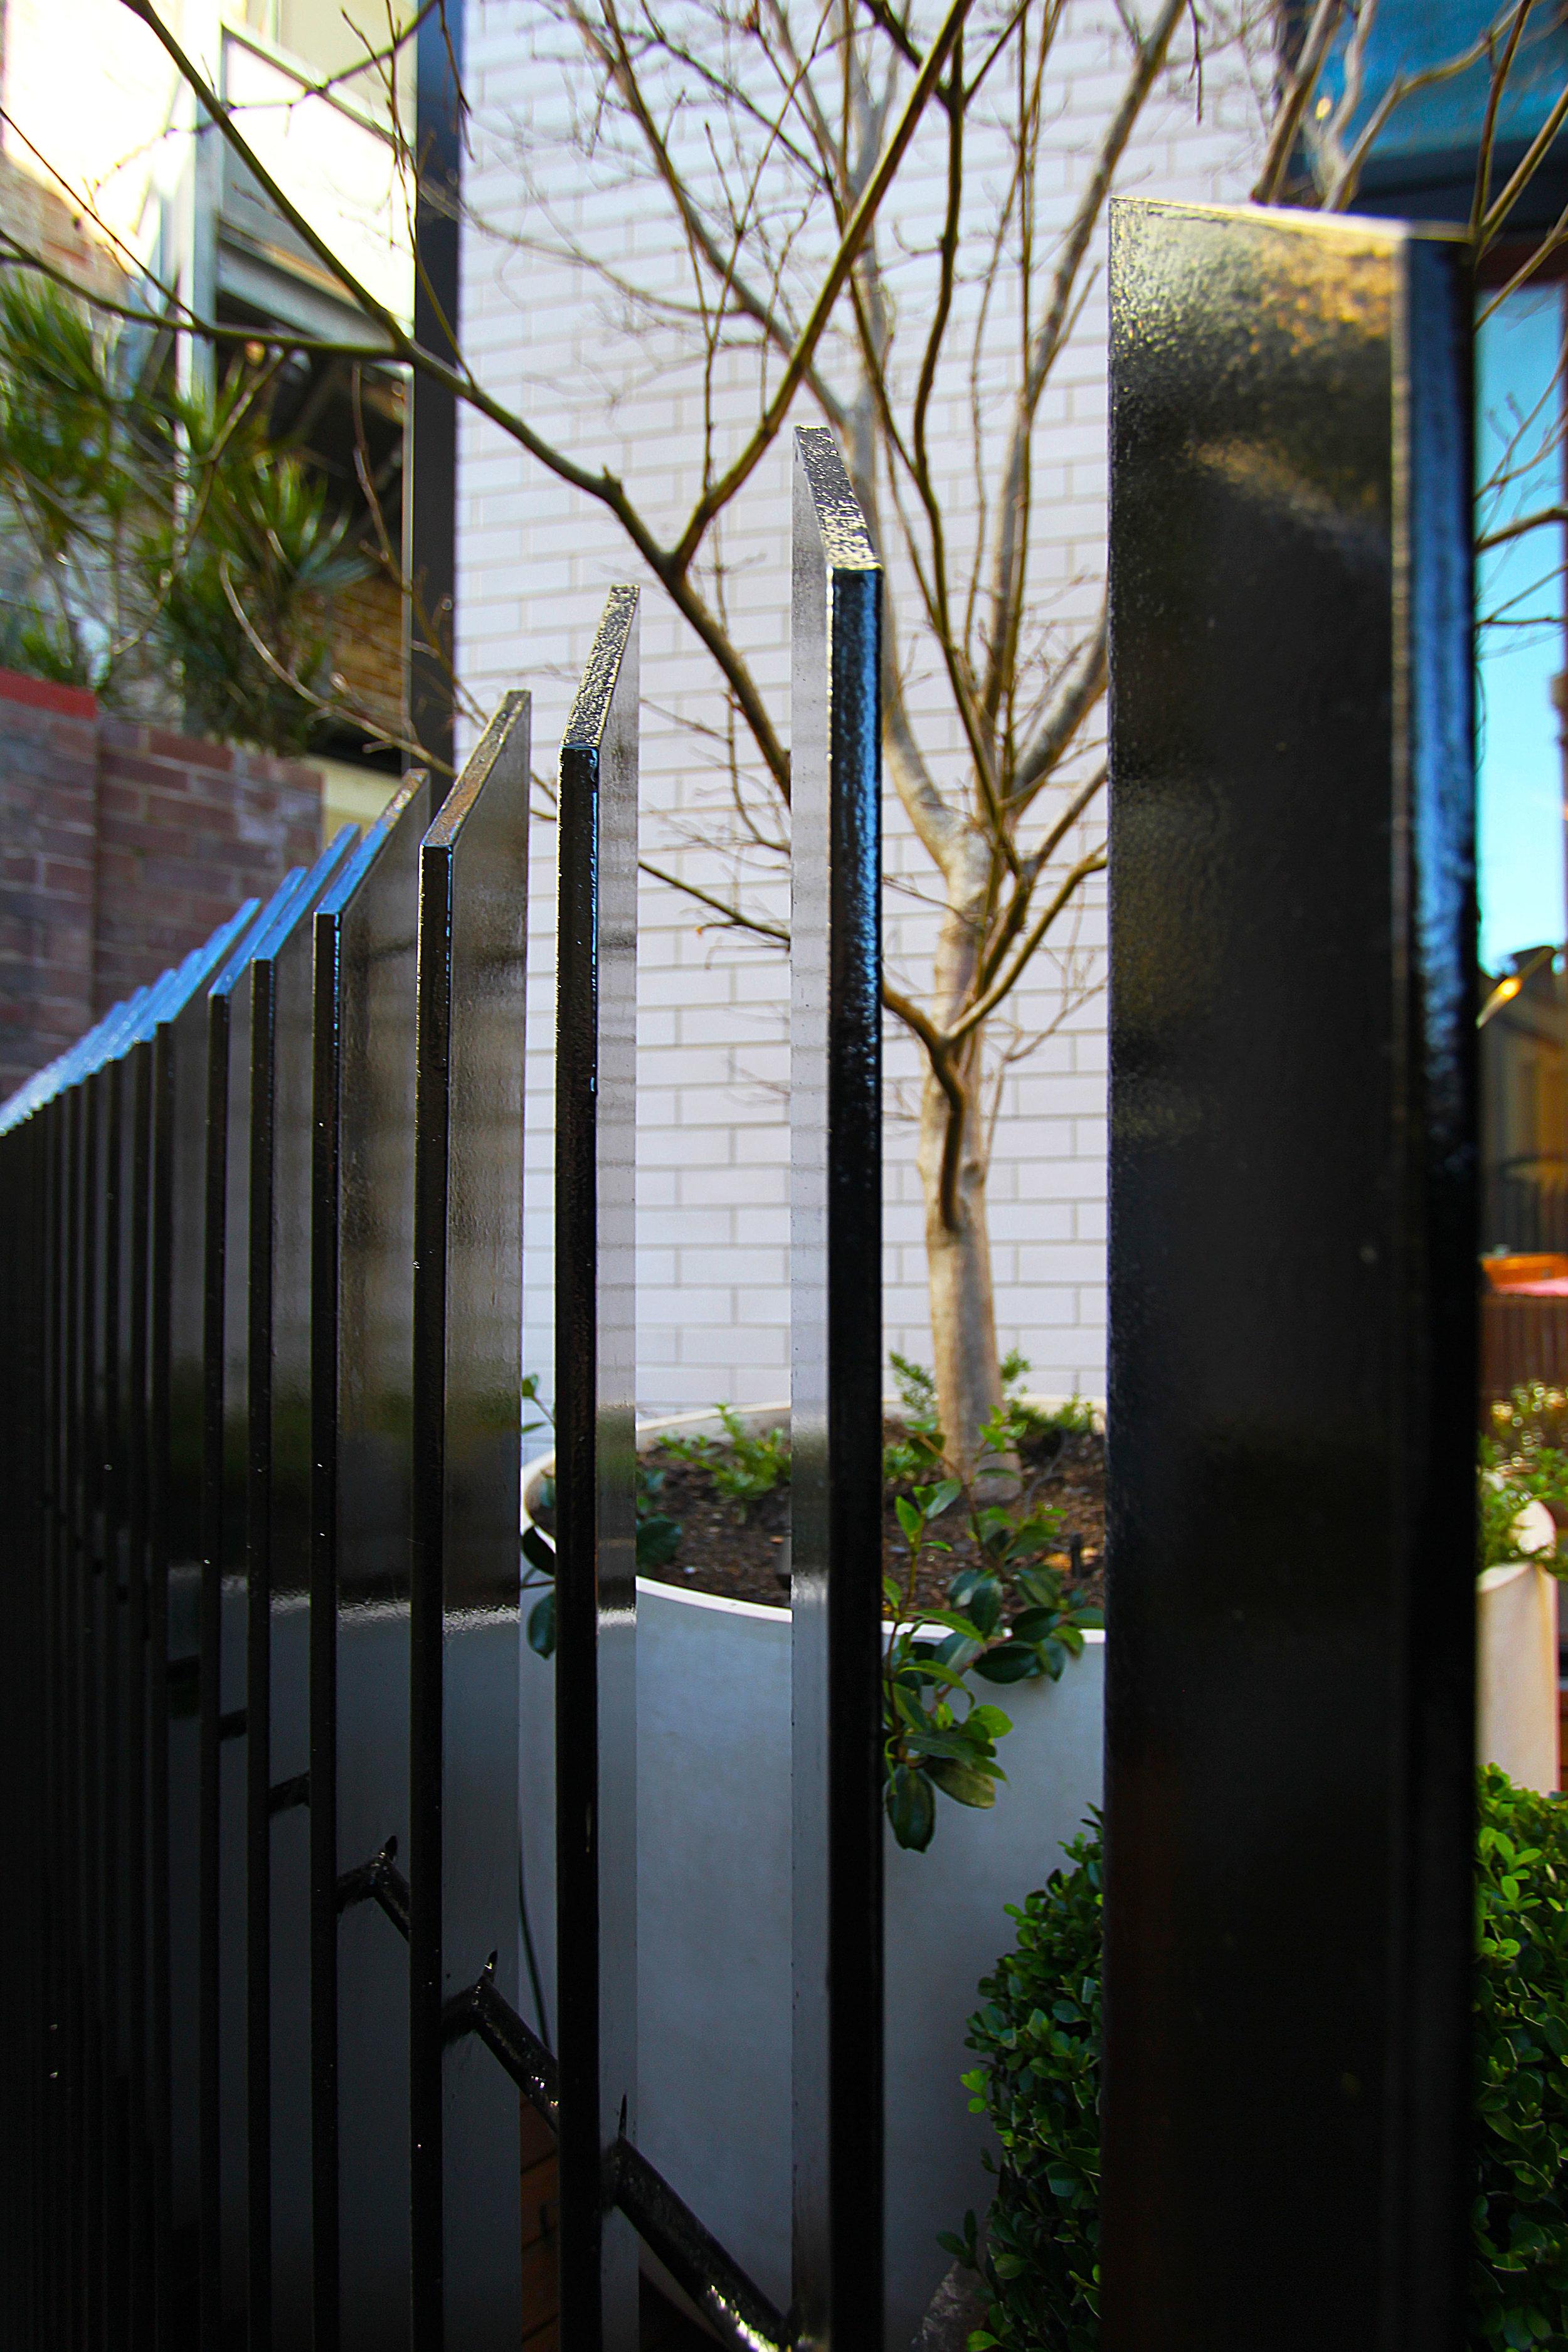 TYA Photography | Little Albion Guest House | Little Albion Street | Fencing | Winter | Arvo 02 | A9109.jpg